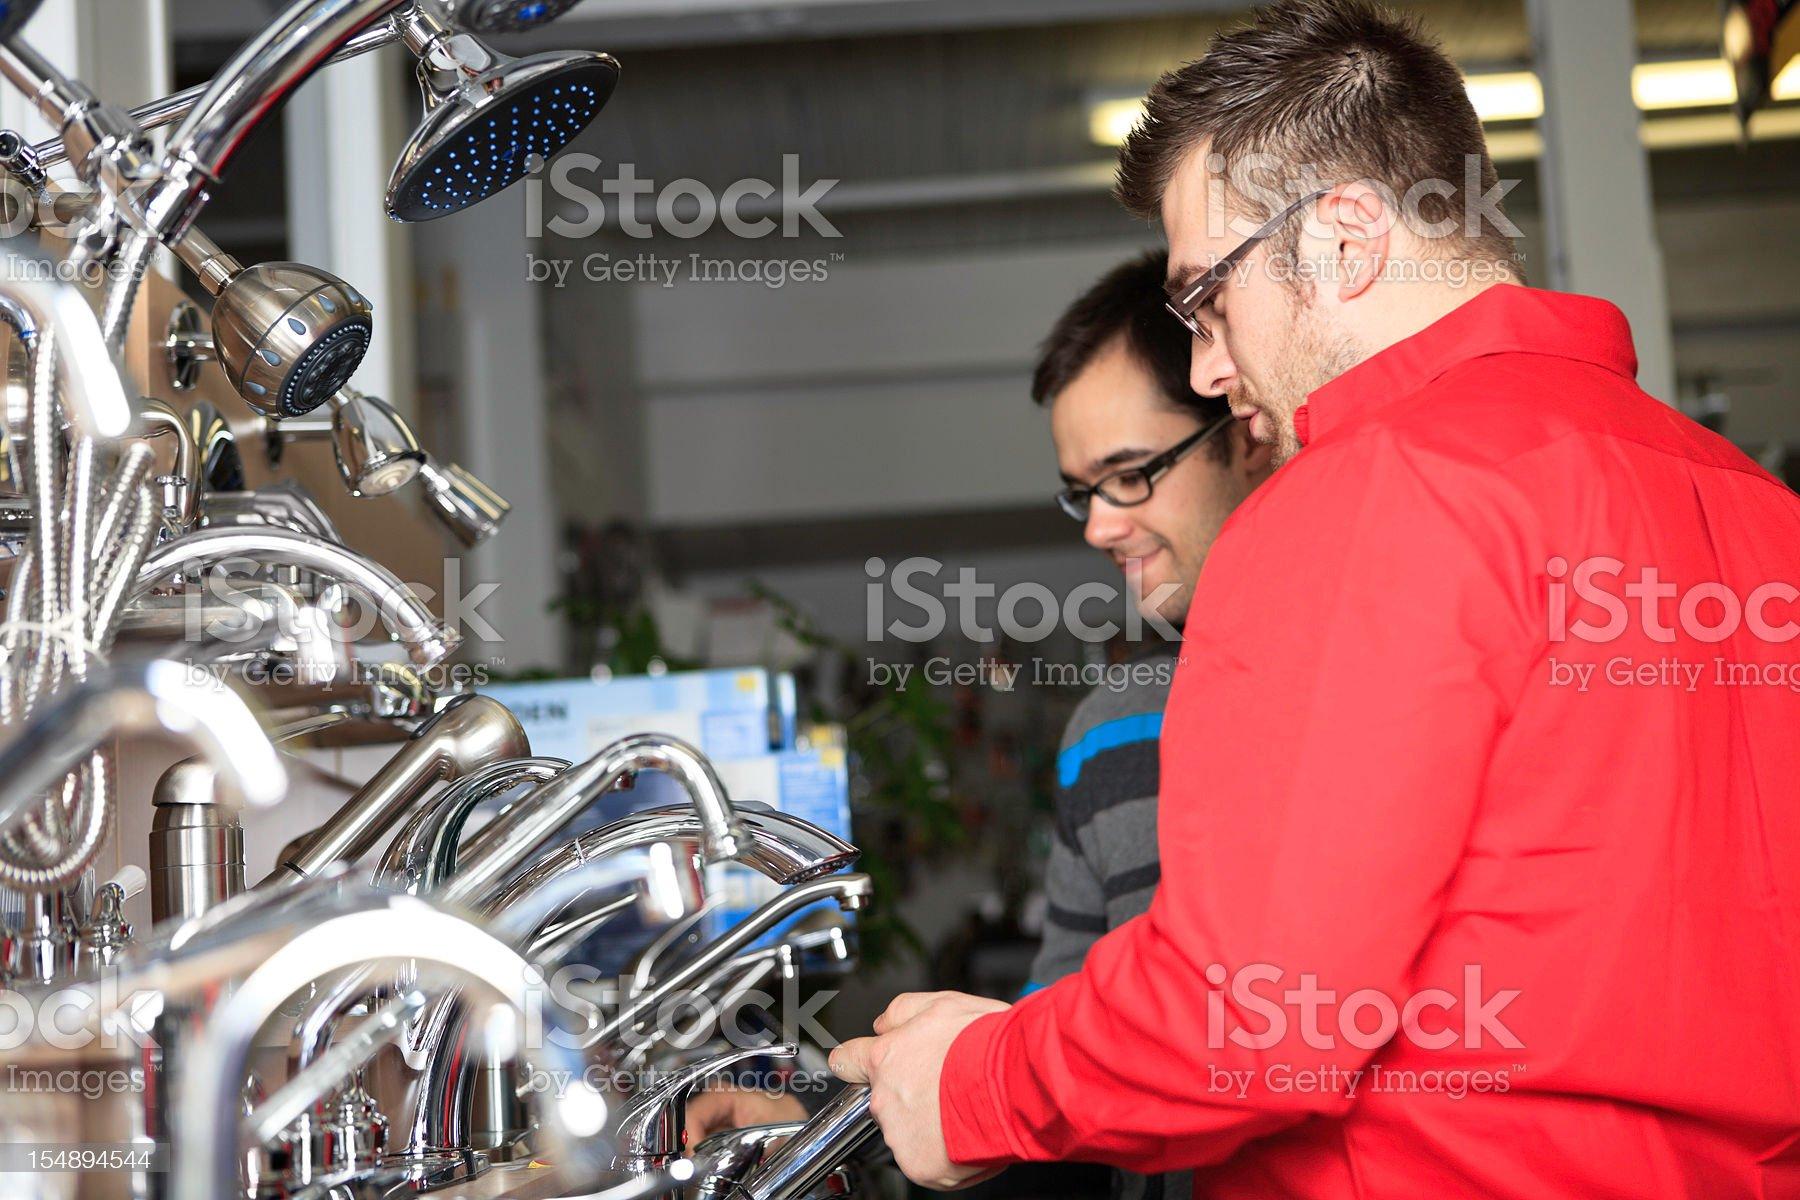 Clerk Help Customer Hardware Store royalty-free stock photo